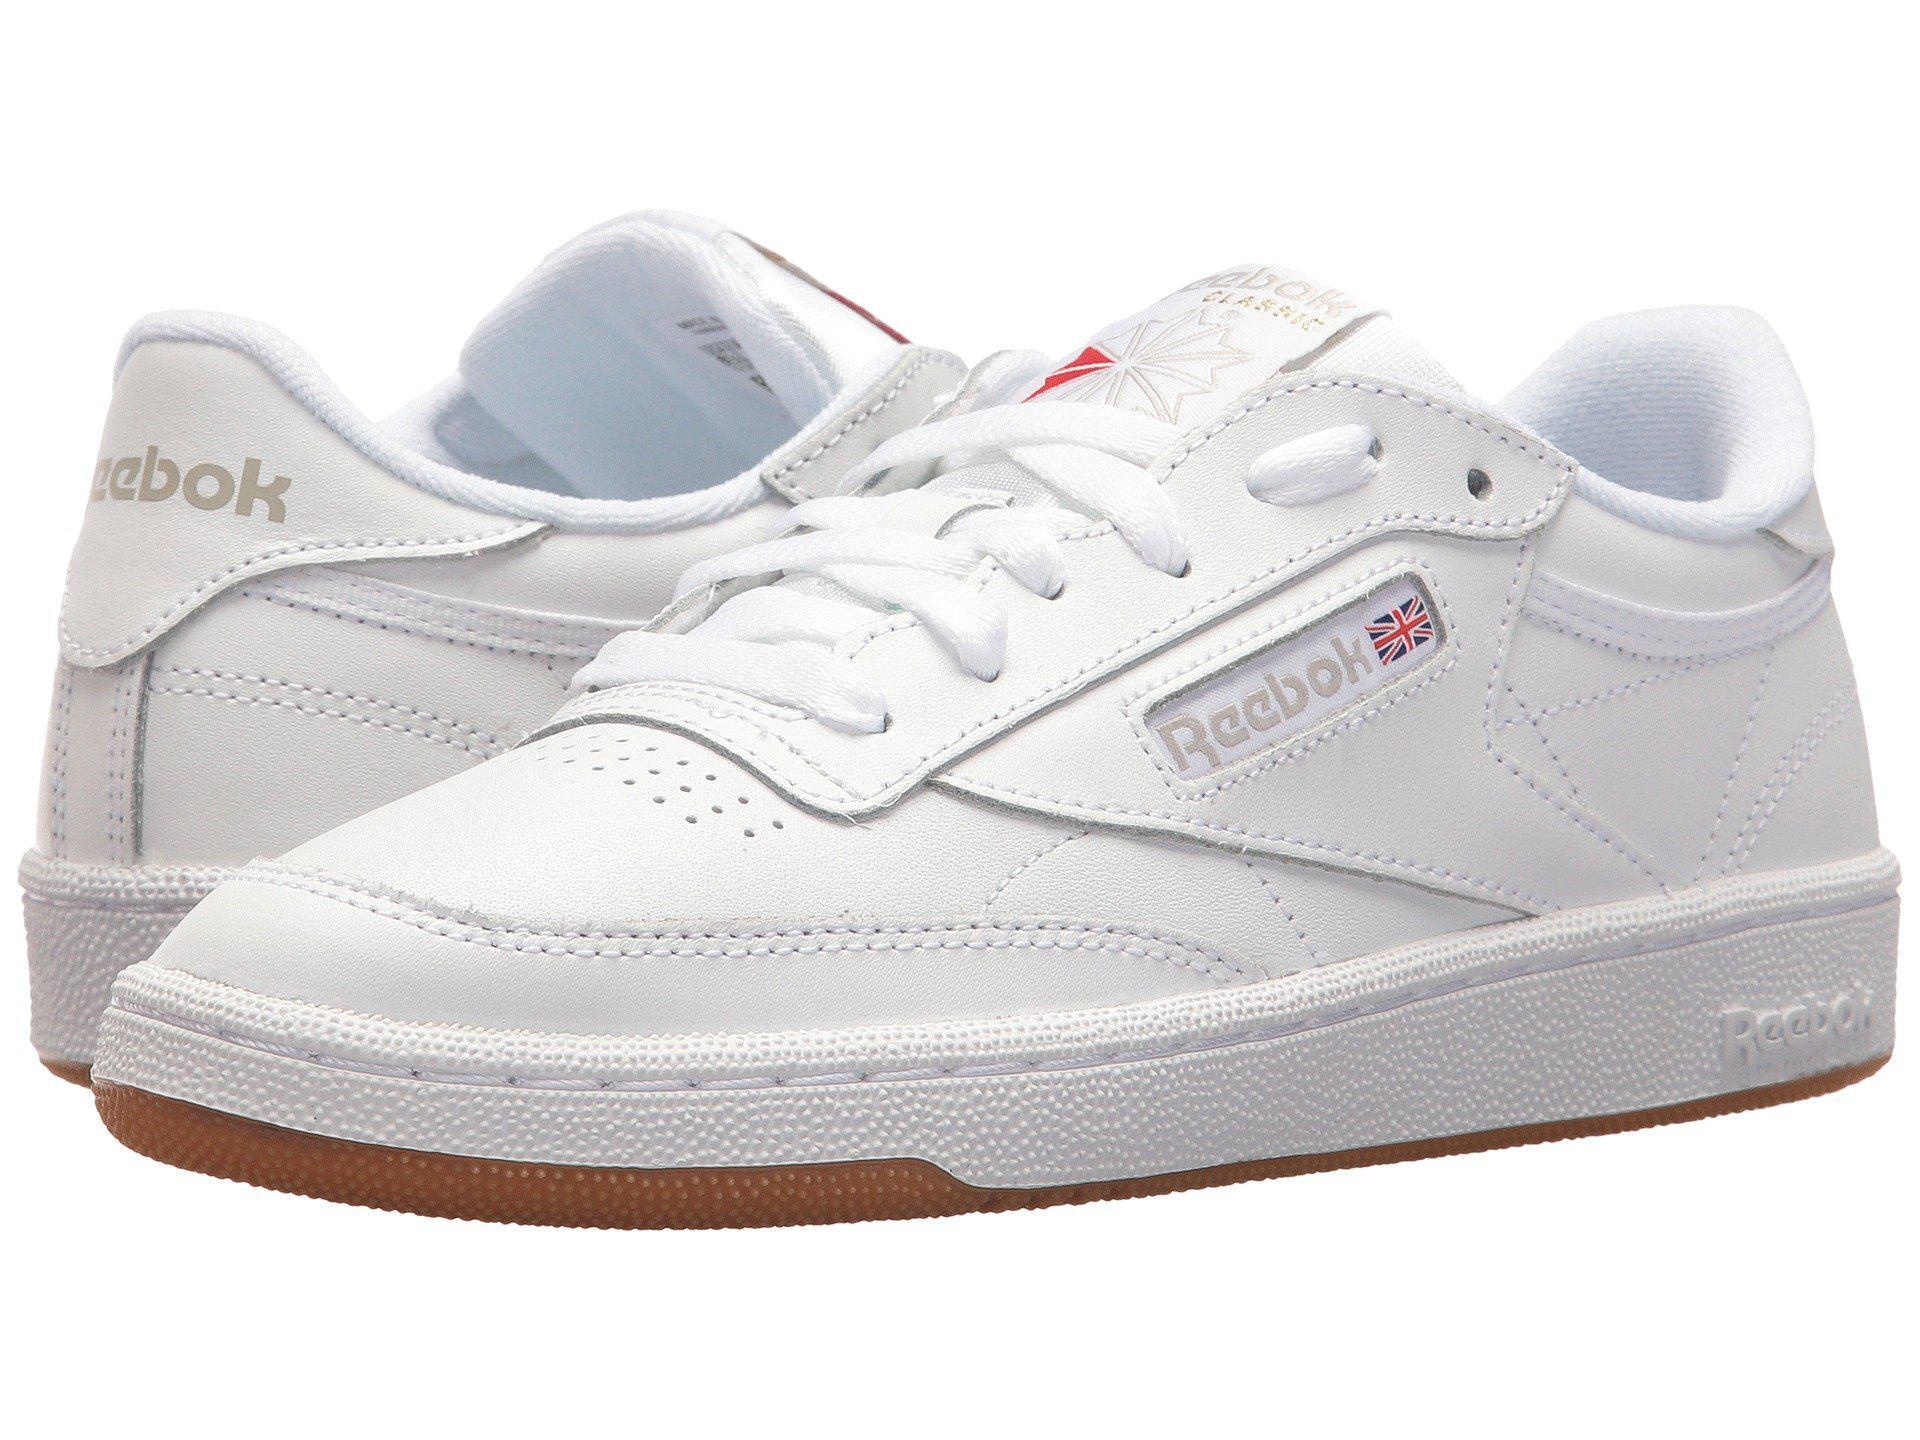 78beaa6d96e Lyst - Reebok Club C 85 (white light Grey gum) Women s Shoes